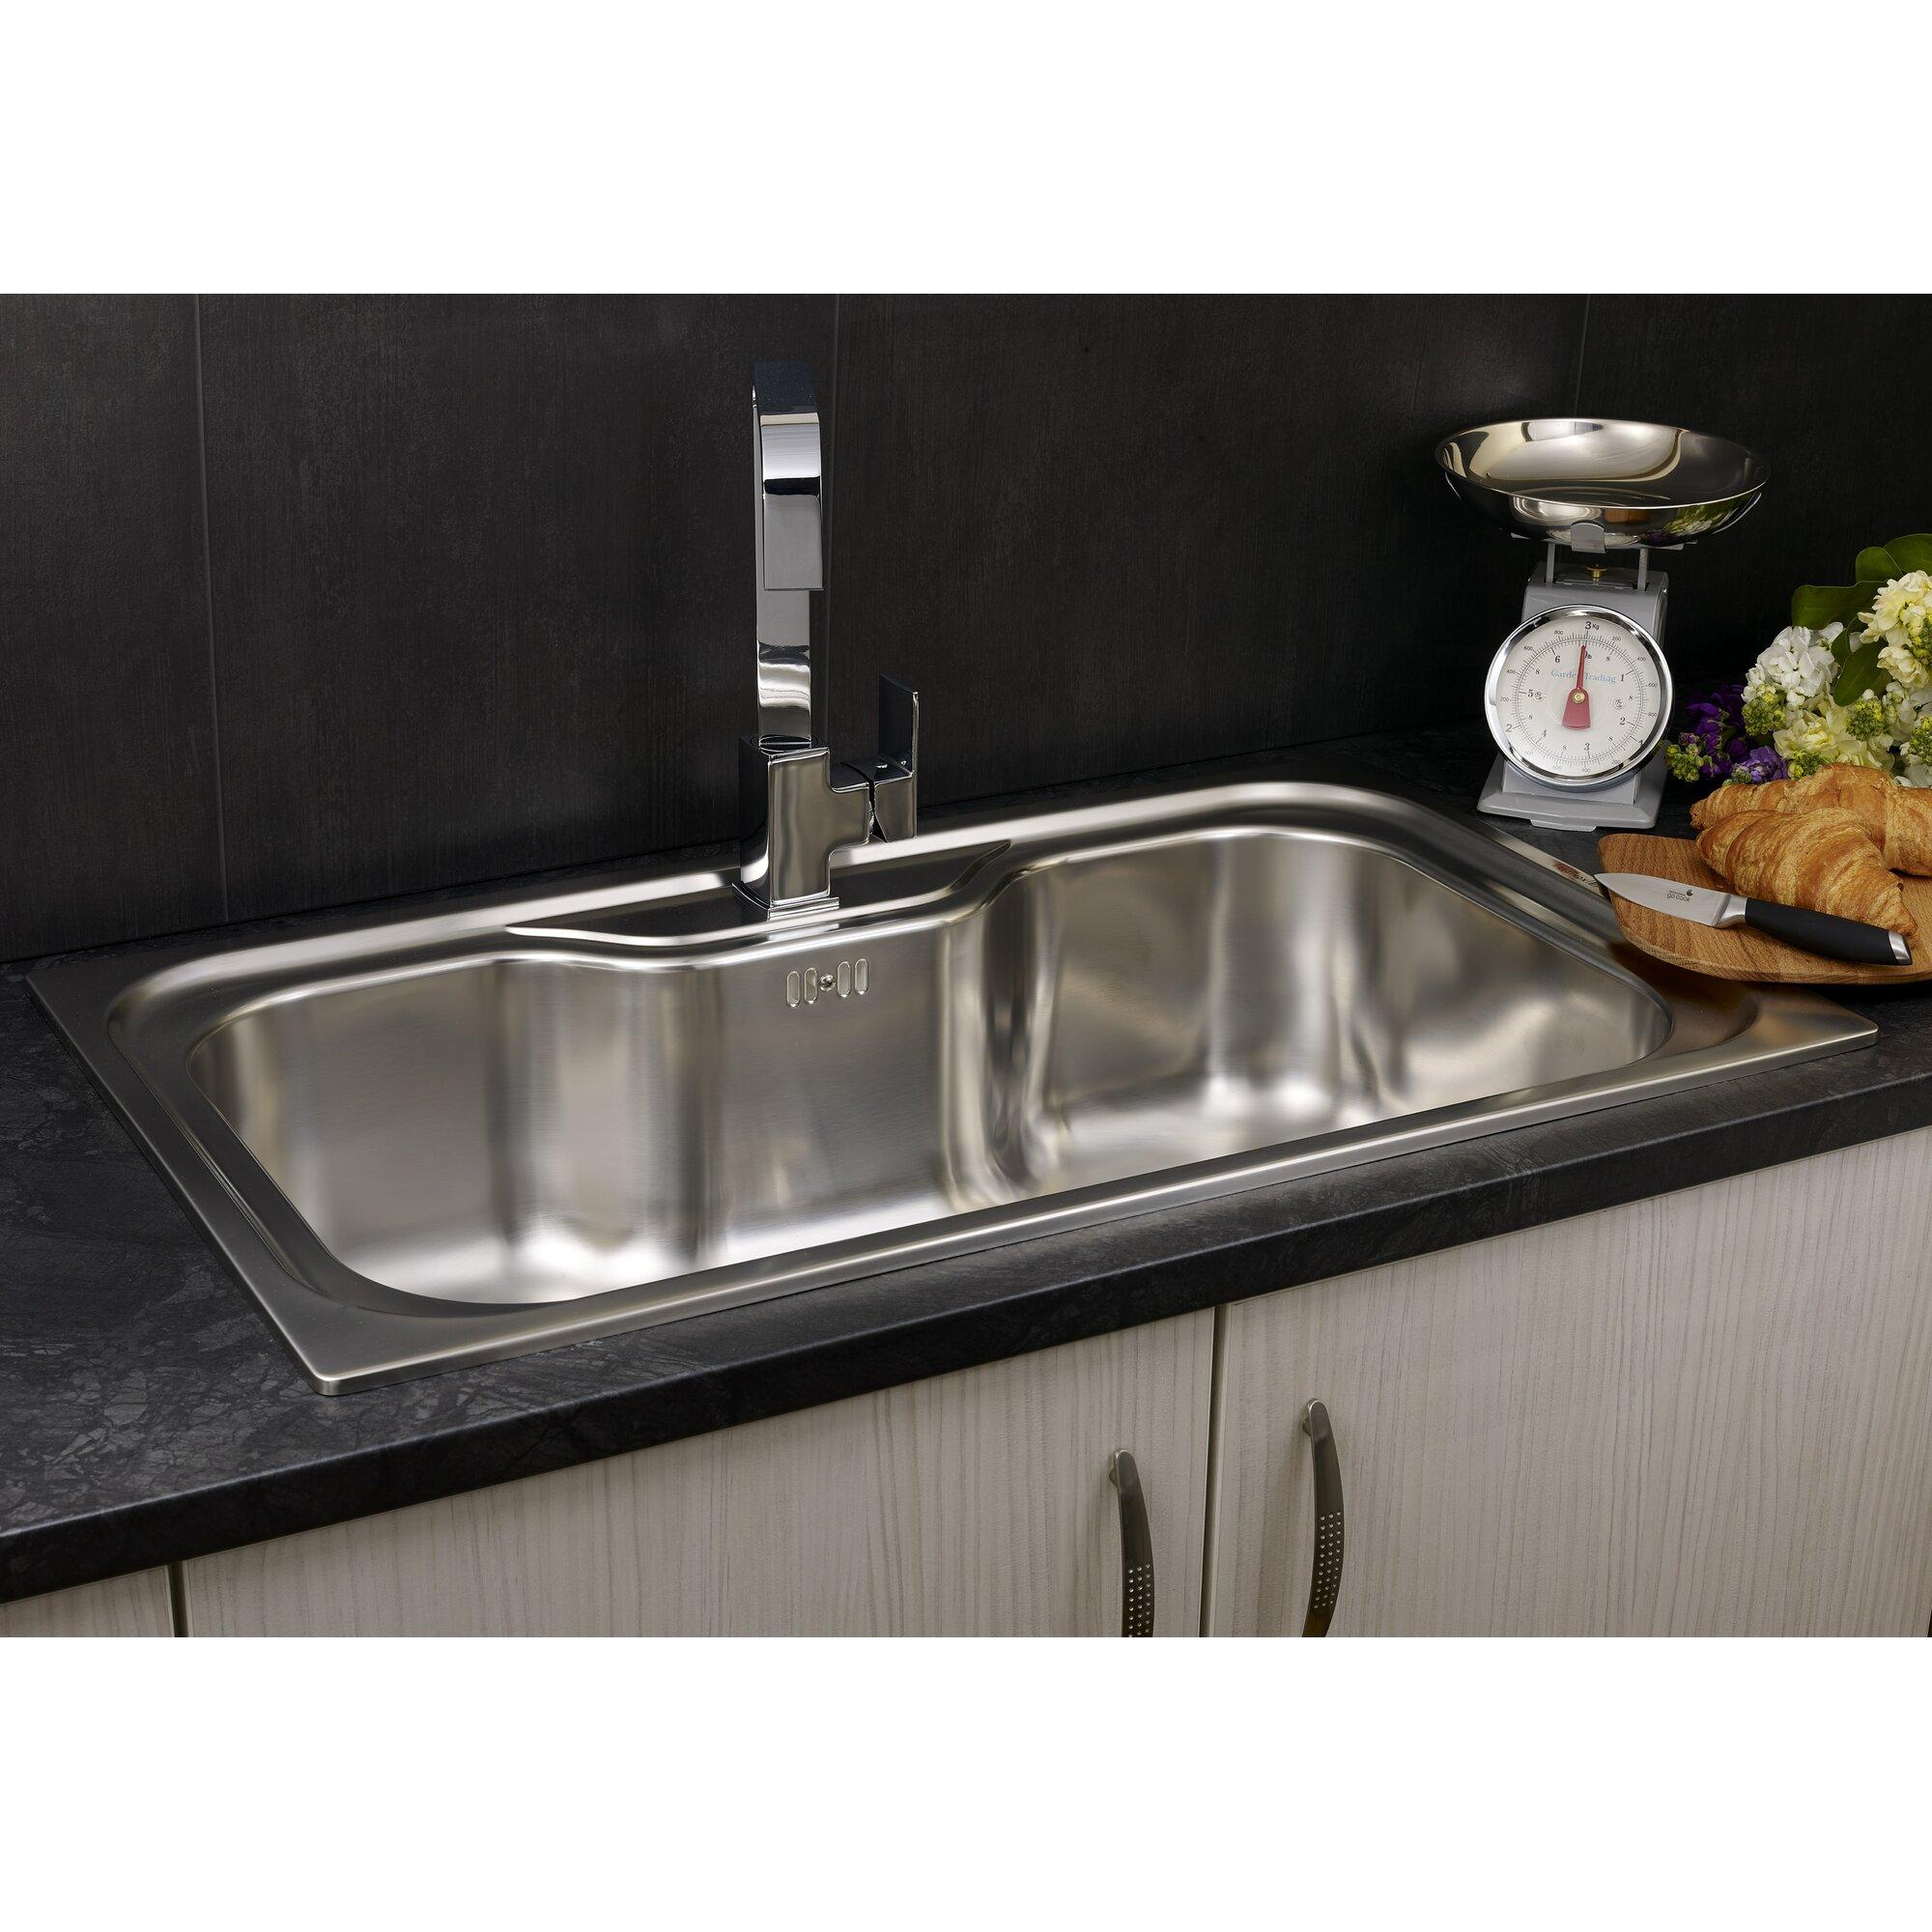 jumbo 86cm x 51cm single bowl inset kitchen sink - Kitchen Sink Uk